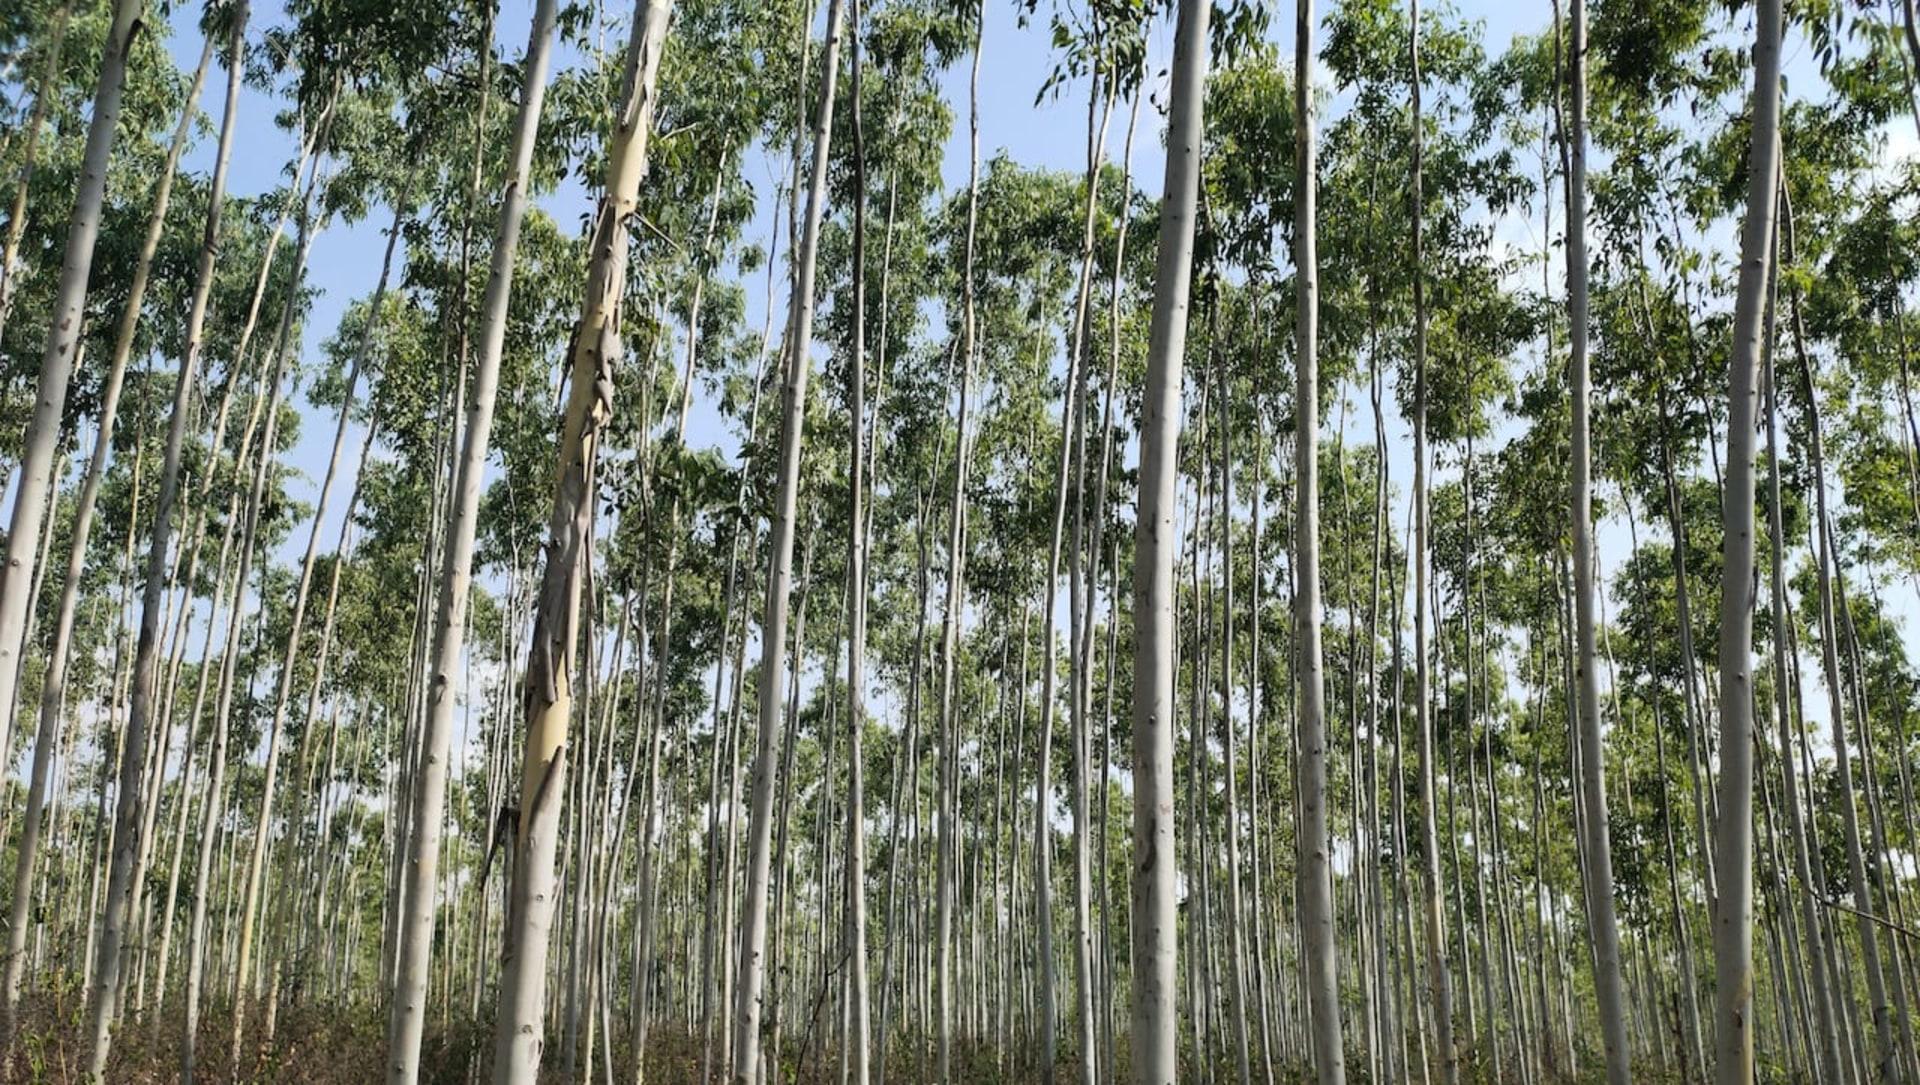 Economy or Ecology? Eucalyptus Plantations in Coastal Andhra Raises Concern